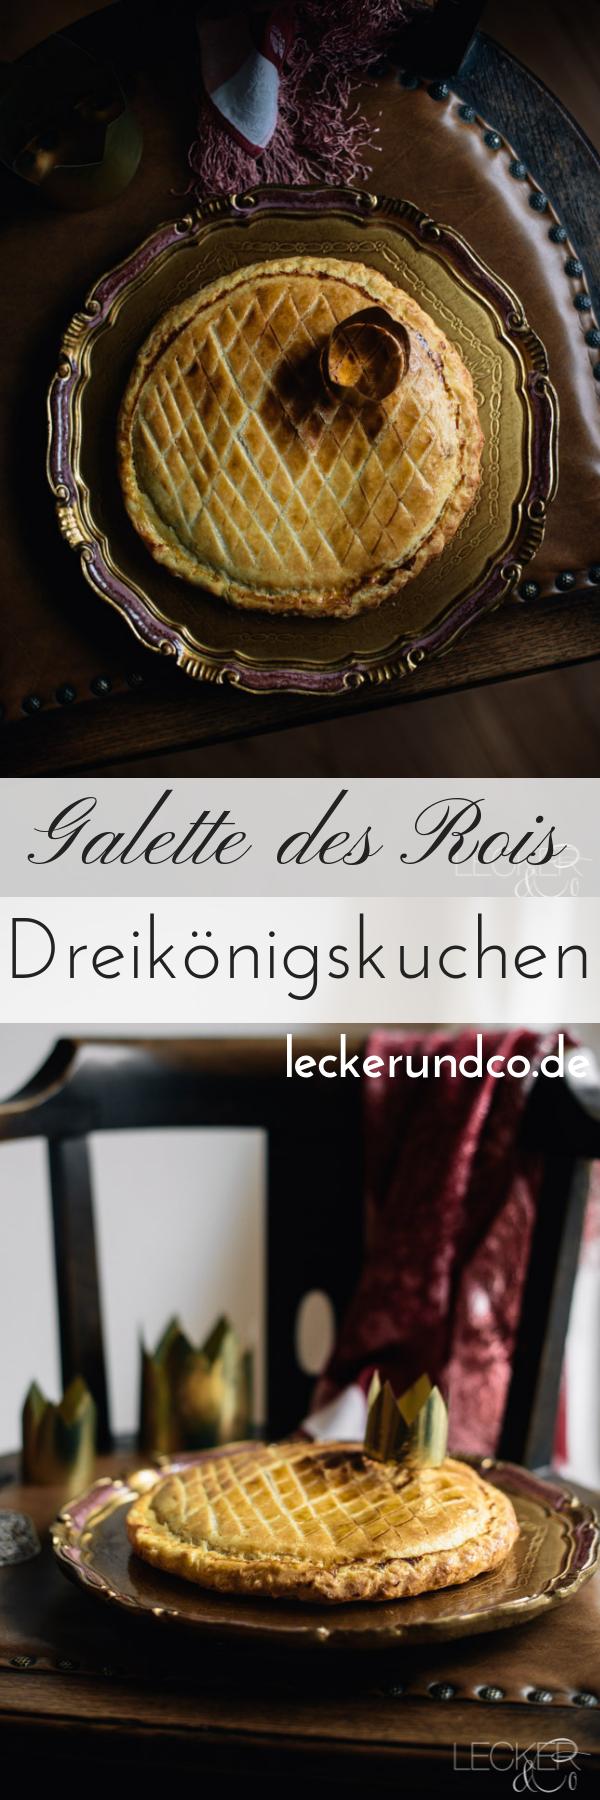 Galette des Rois   Dreikönigskuchen   LECKER&Co   Foodblog aus Nürnberg